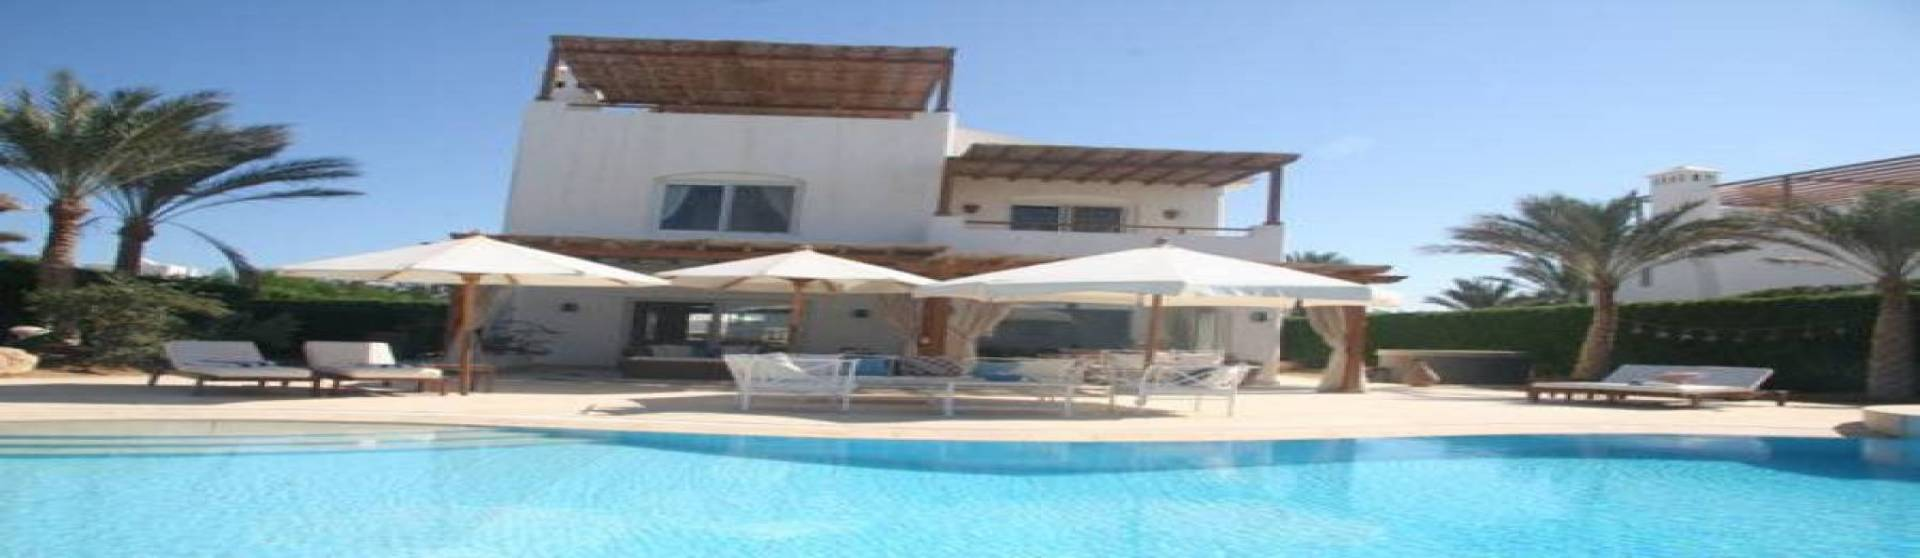 White Villa In El Gouna Phase 5 For Sale